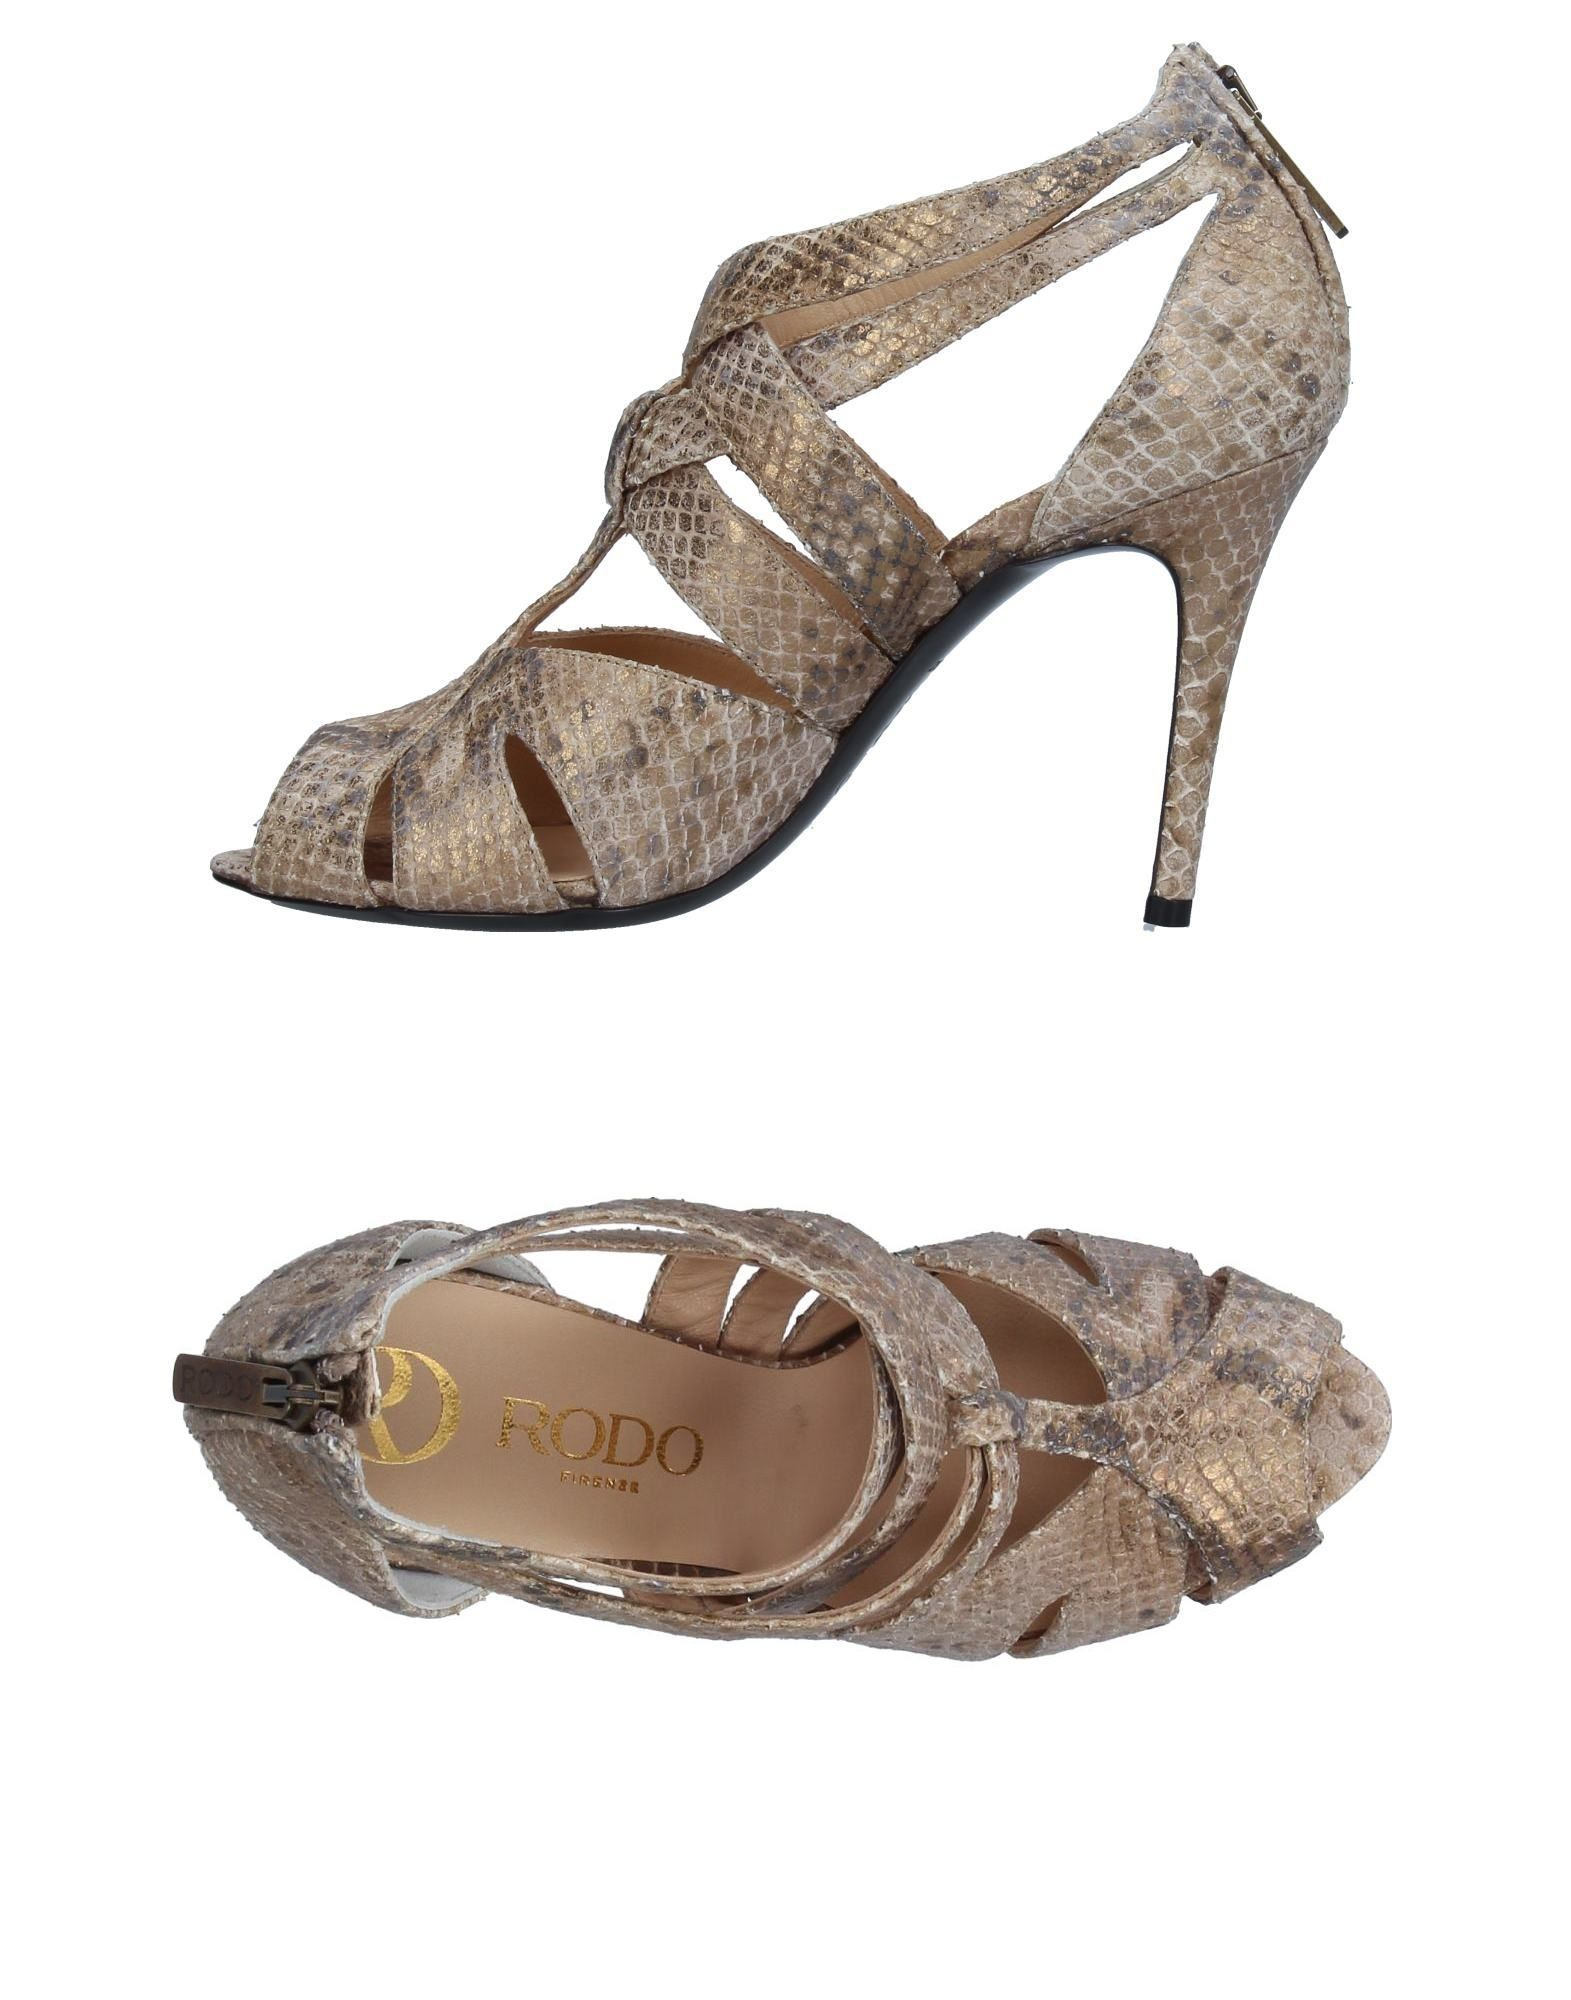 Rodo Sandalen Damen  11368971TM Gute Qualität beliebte Schuhe